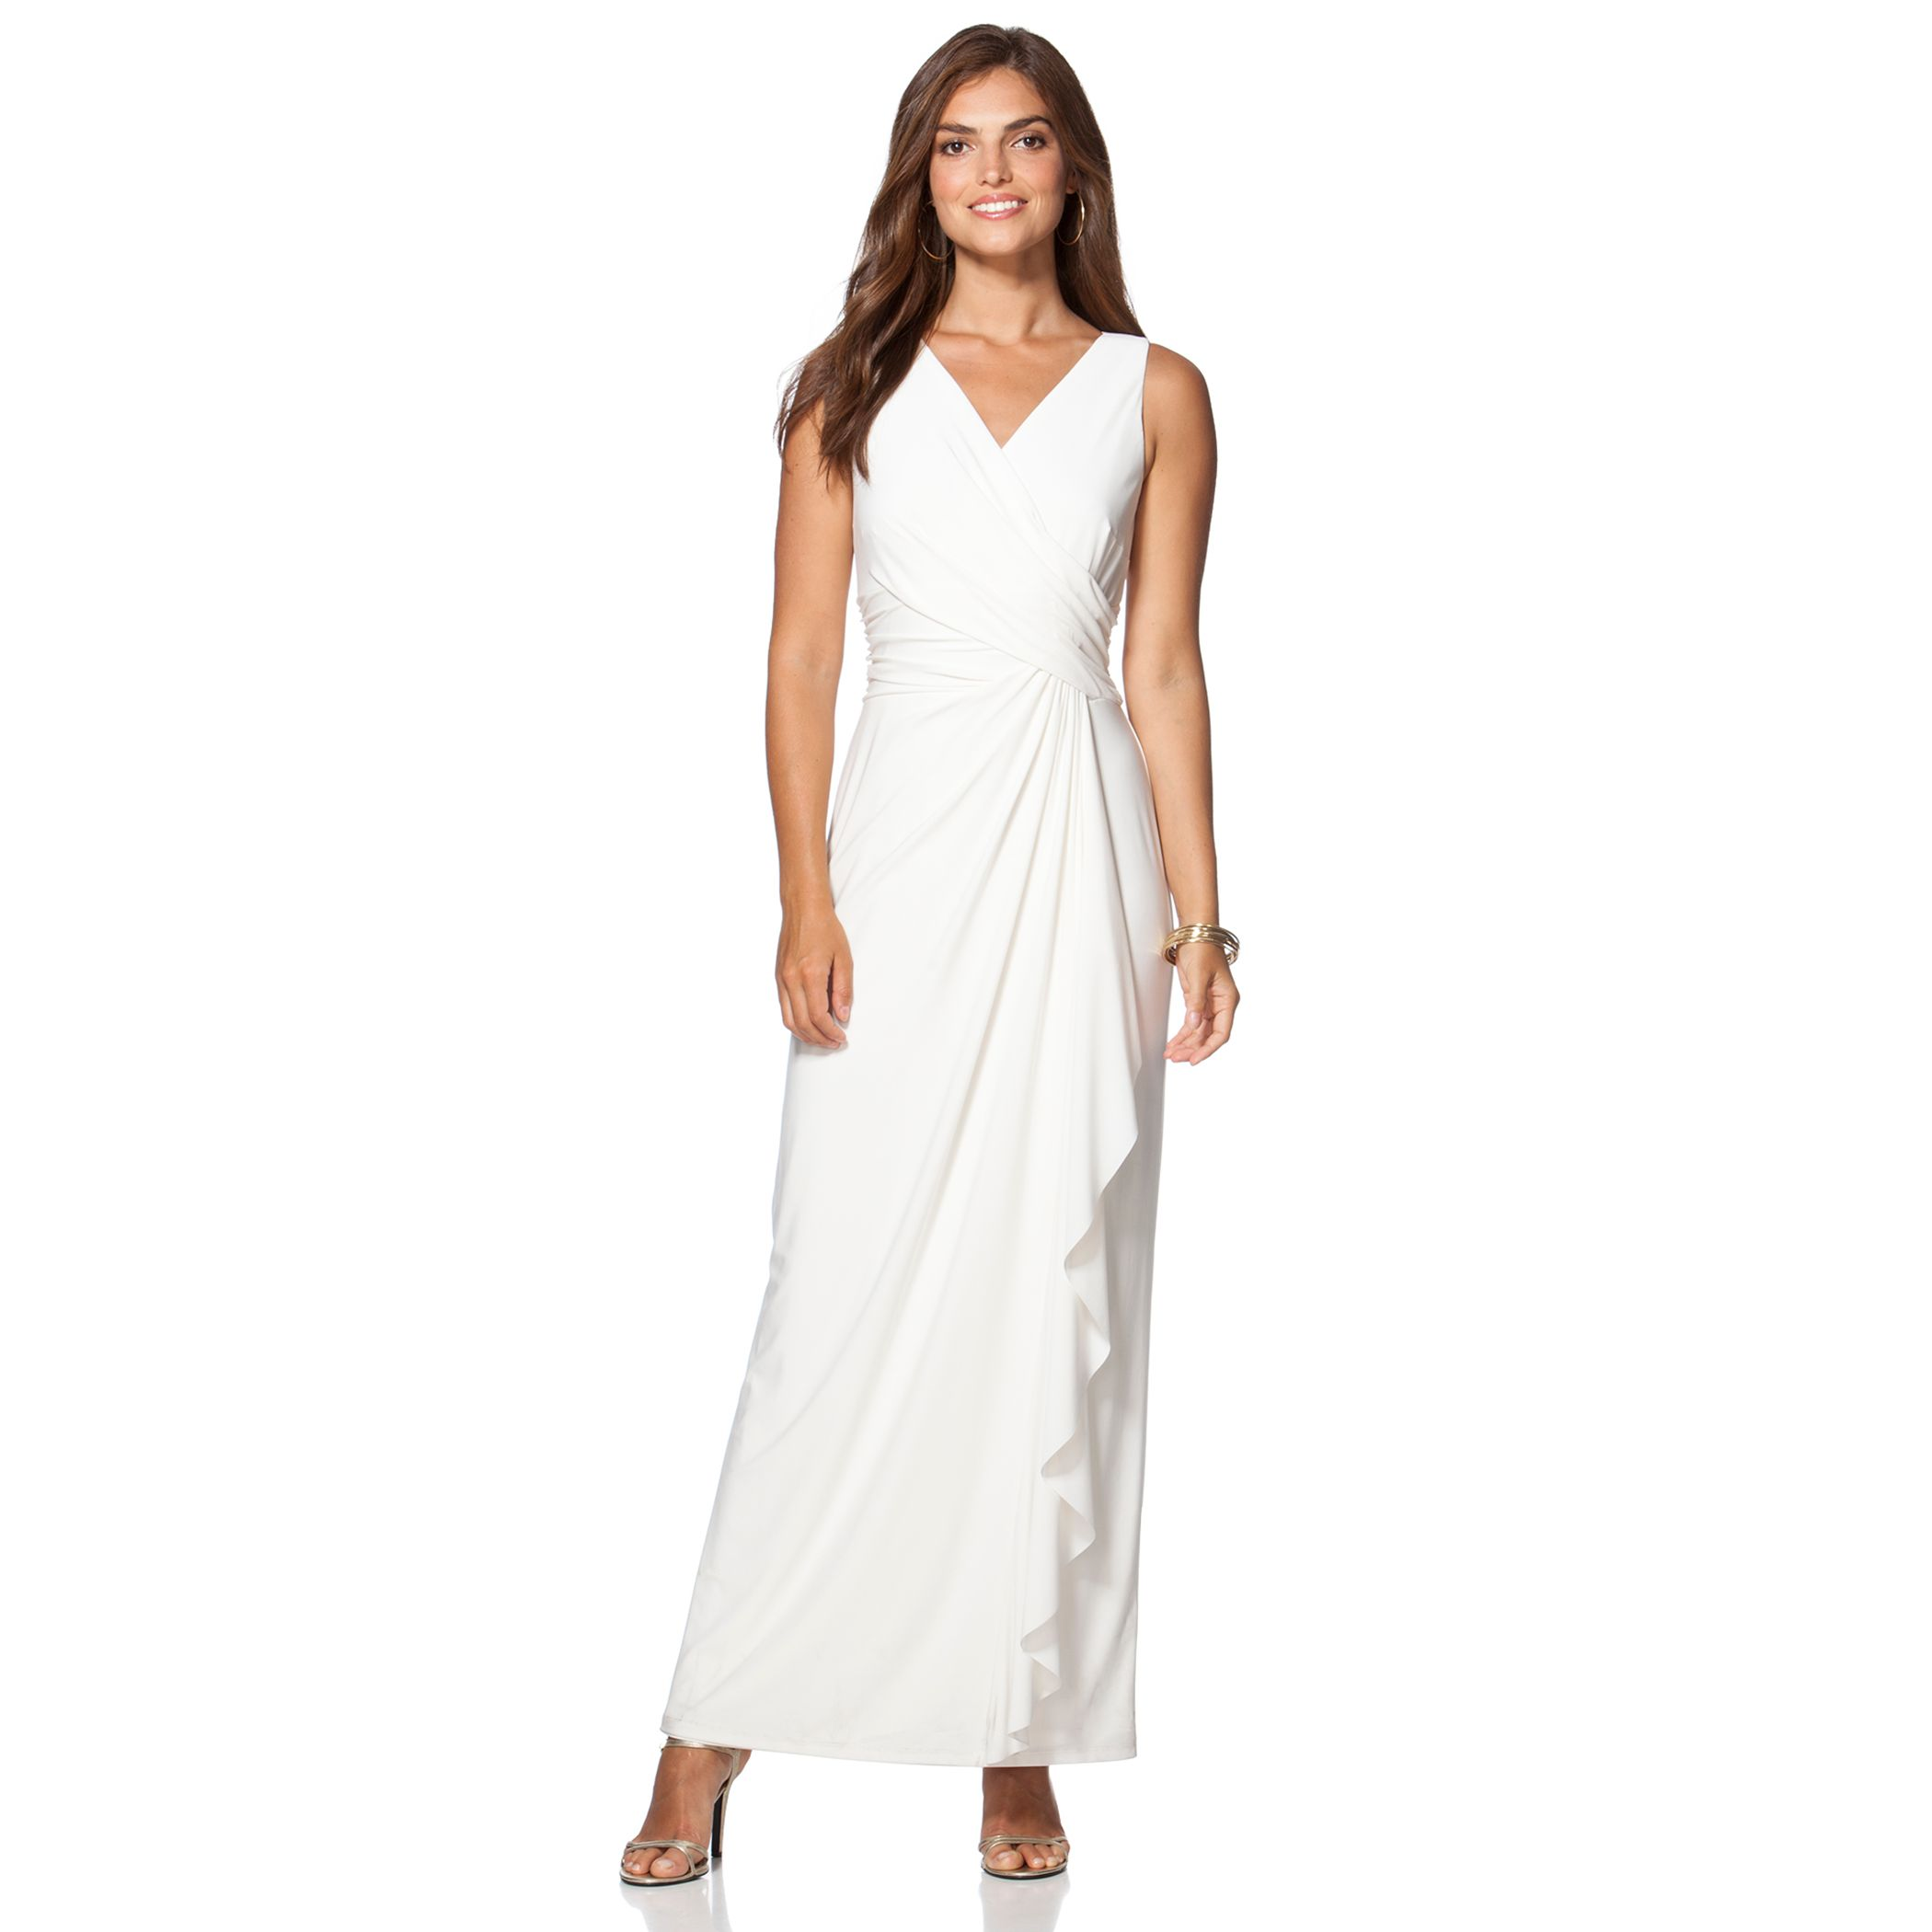 White maxi dress size 14